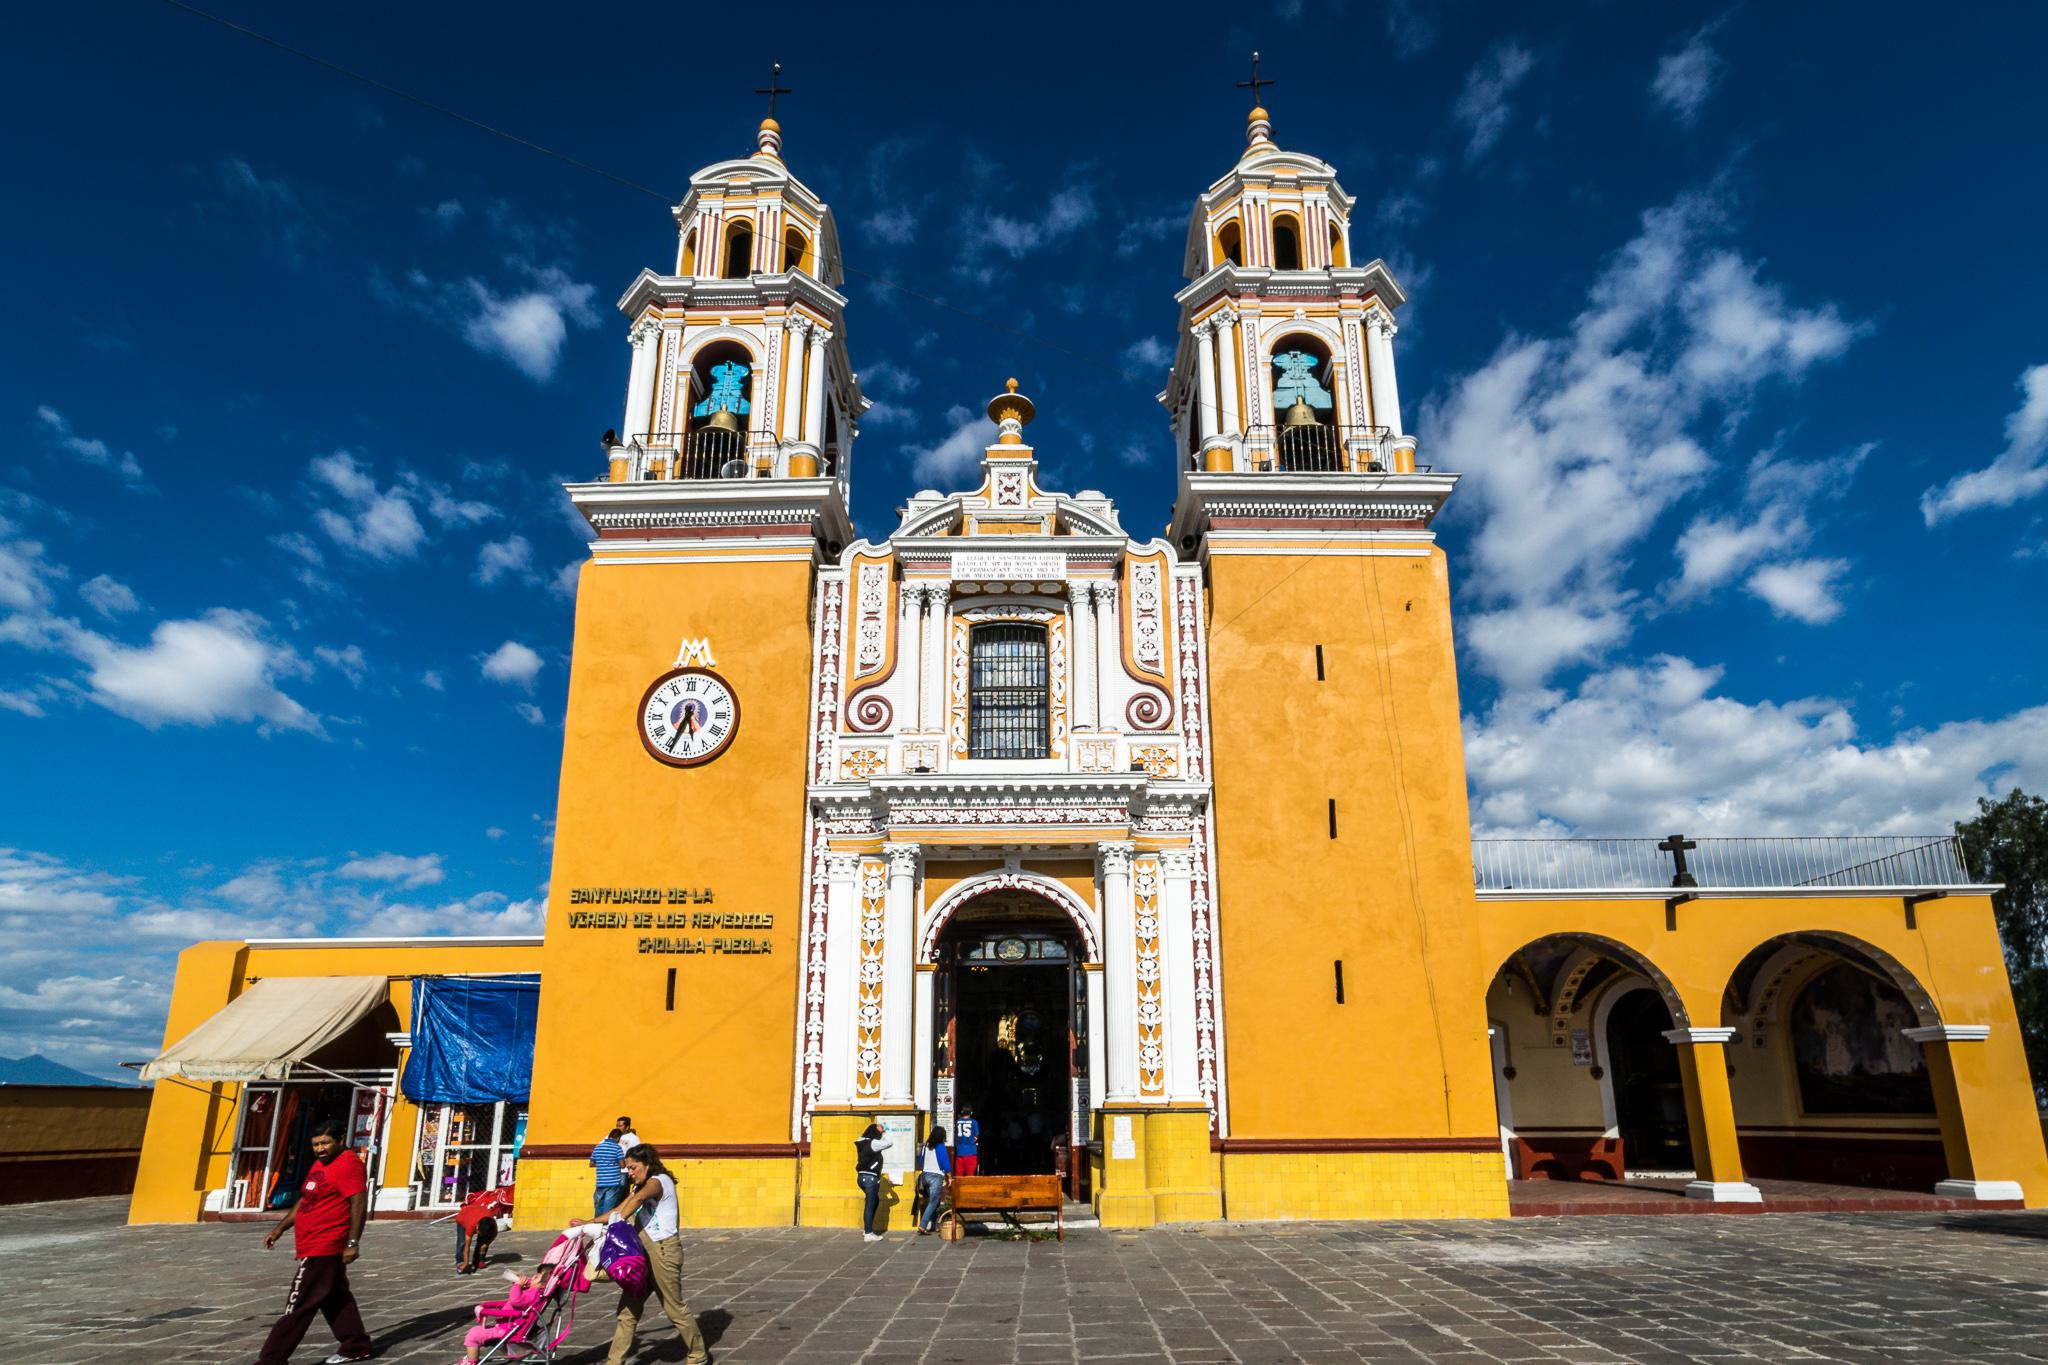 Mexique Juin 2014_001.jpg